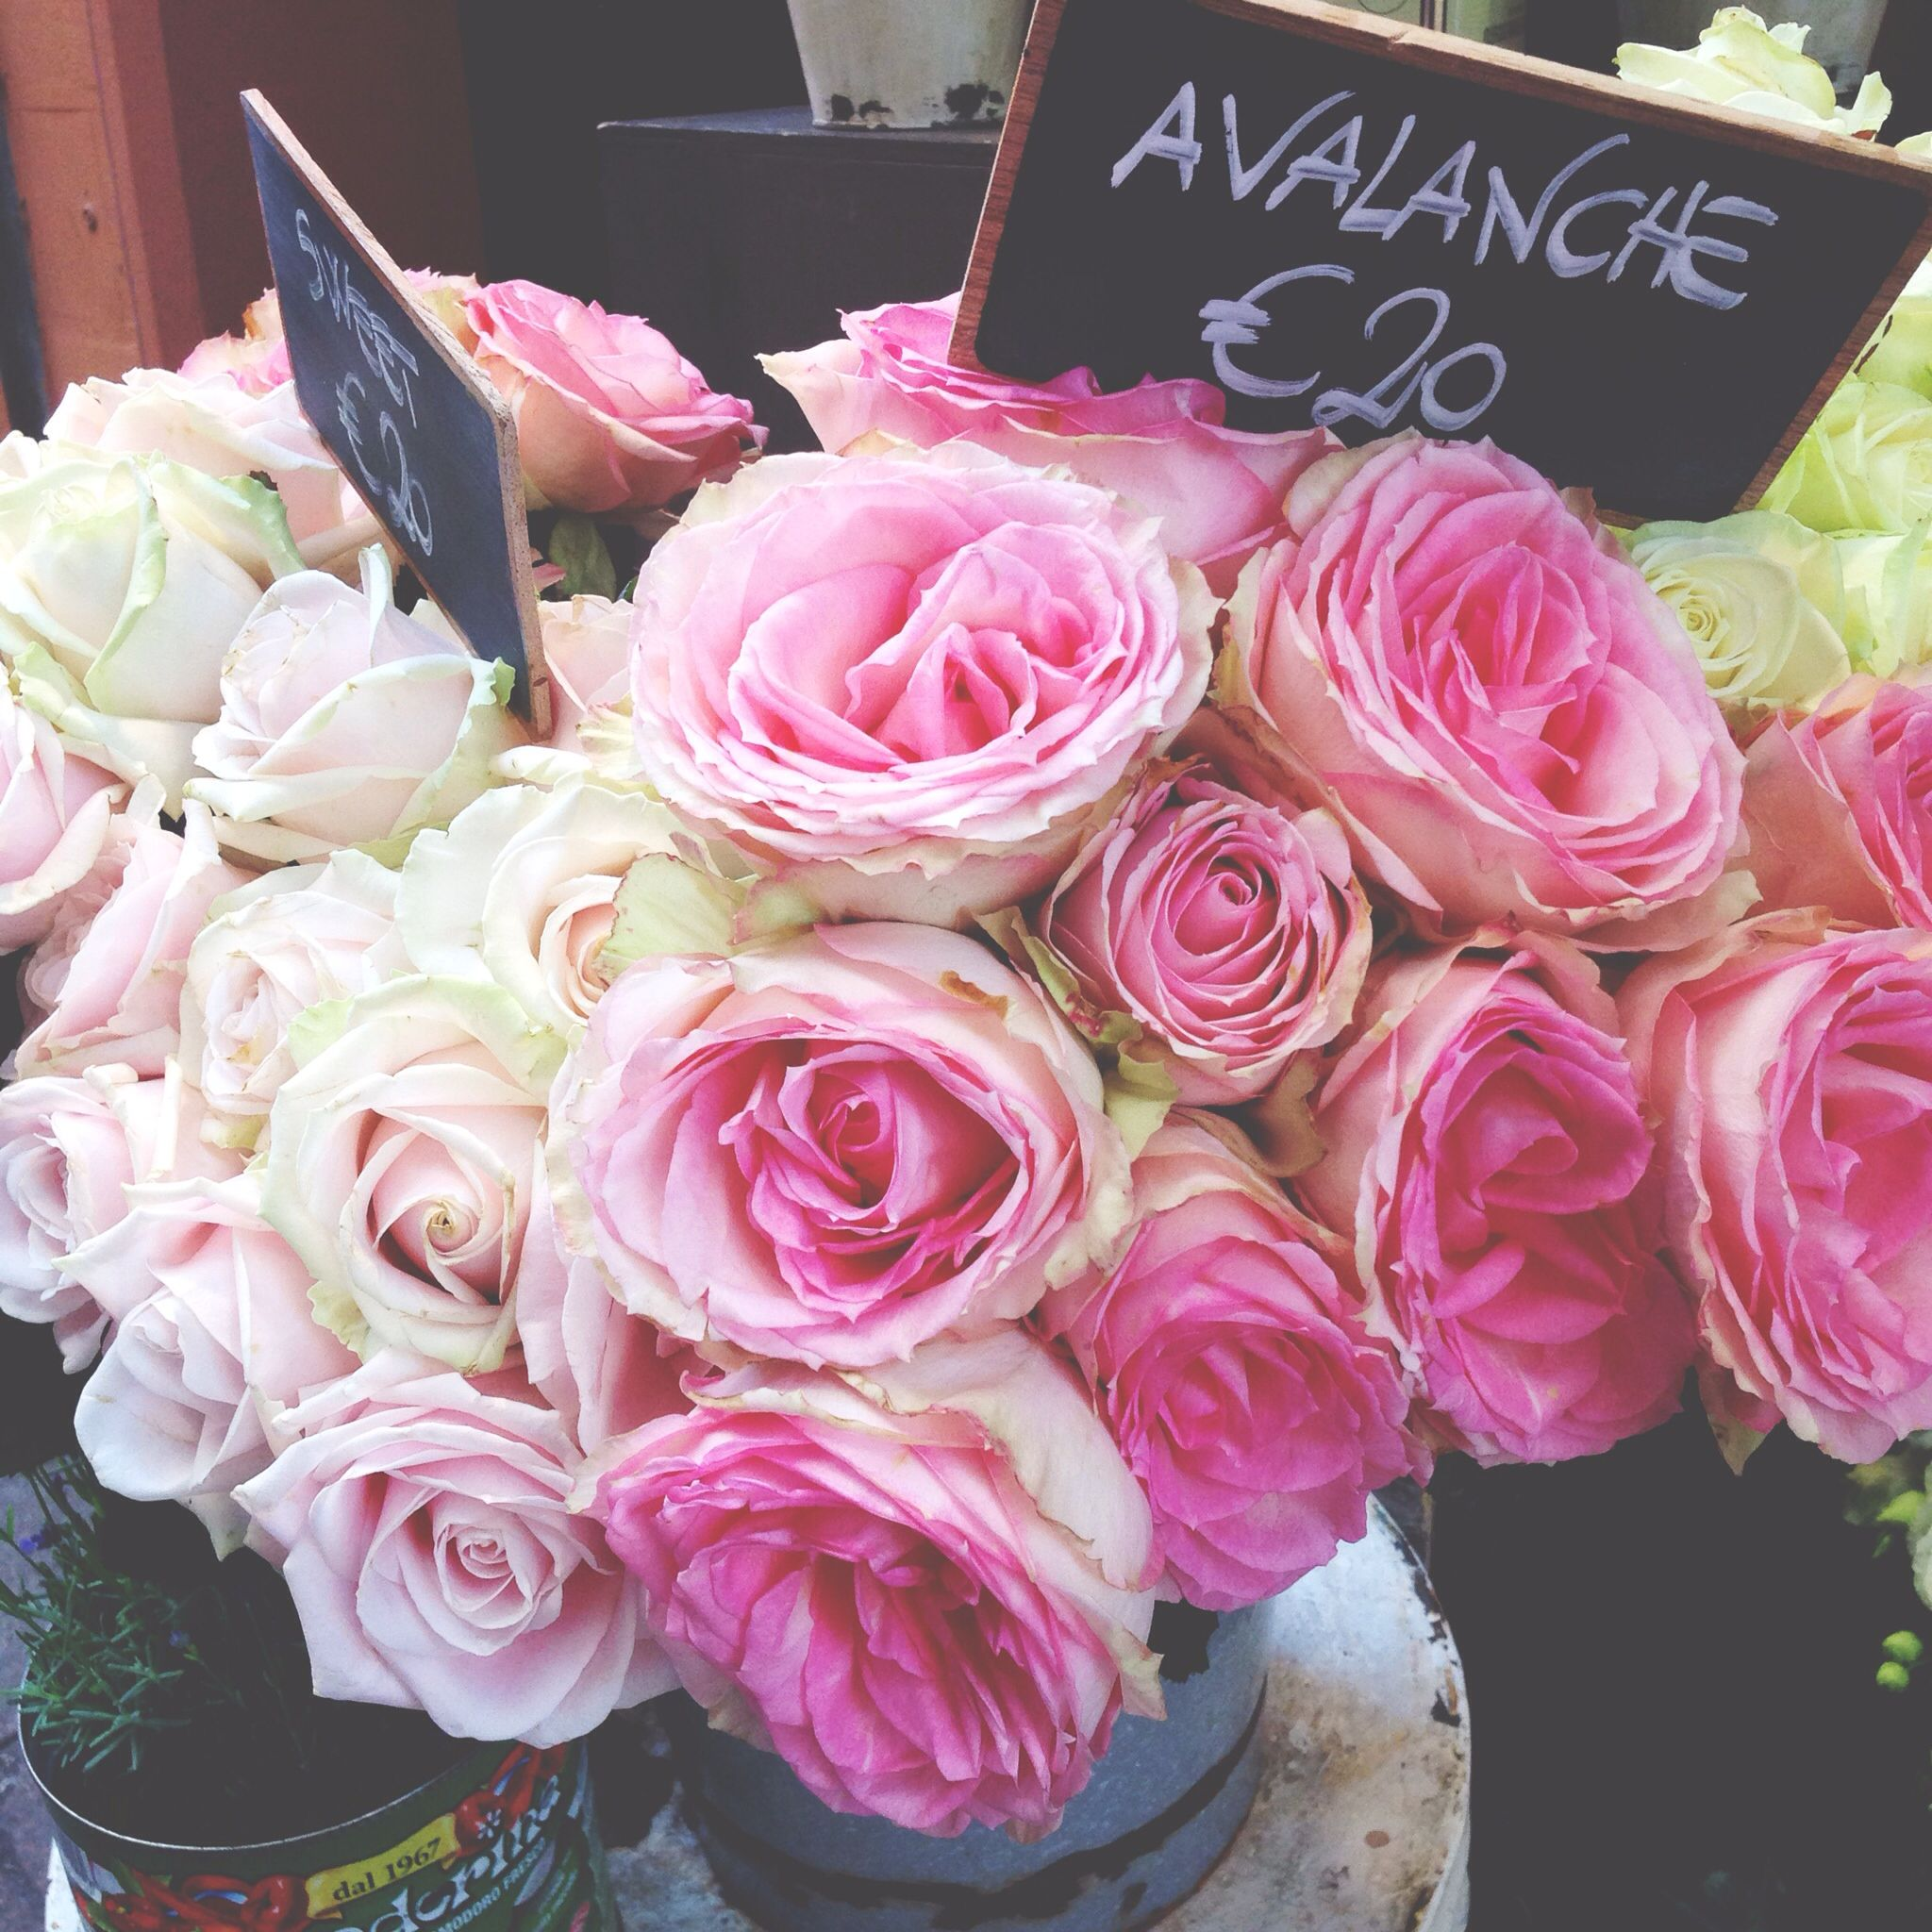 Bologna Flower Market Floral Pinterest Flower Market